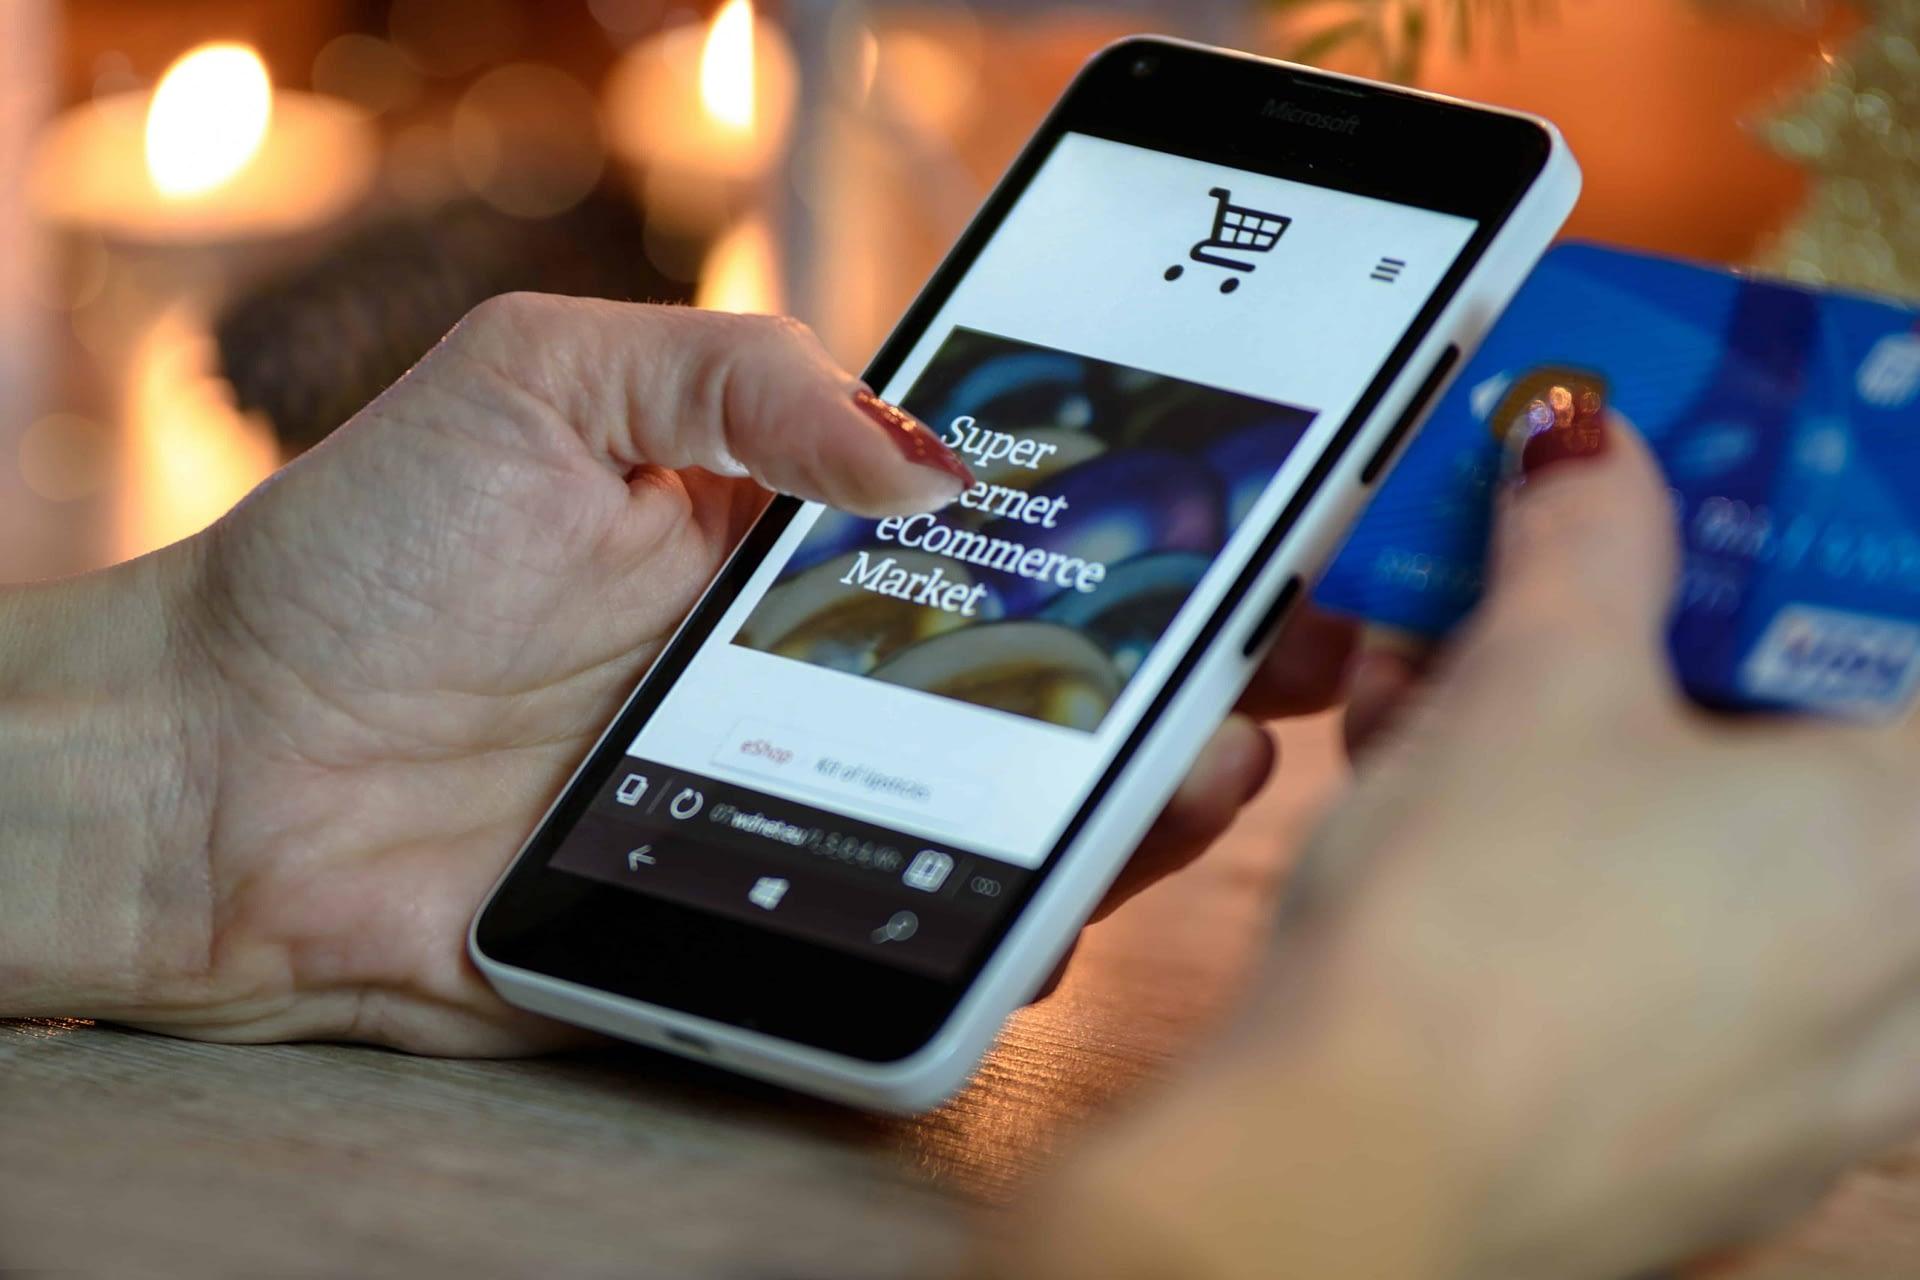 Trend Bisnis Online Yang Menguntungkan 2020 - JasaWebsite.Biz